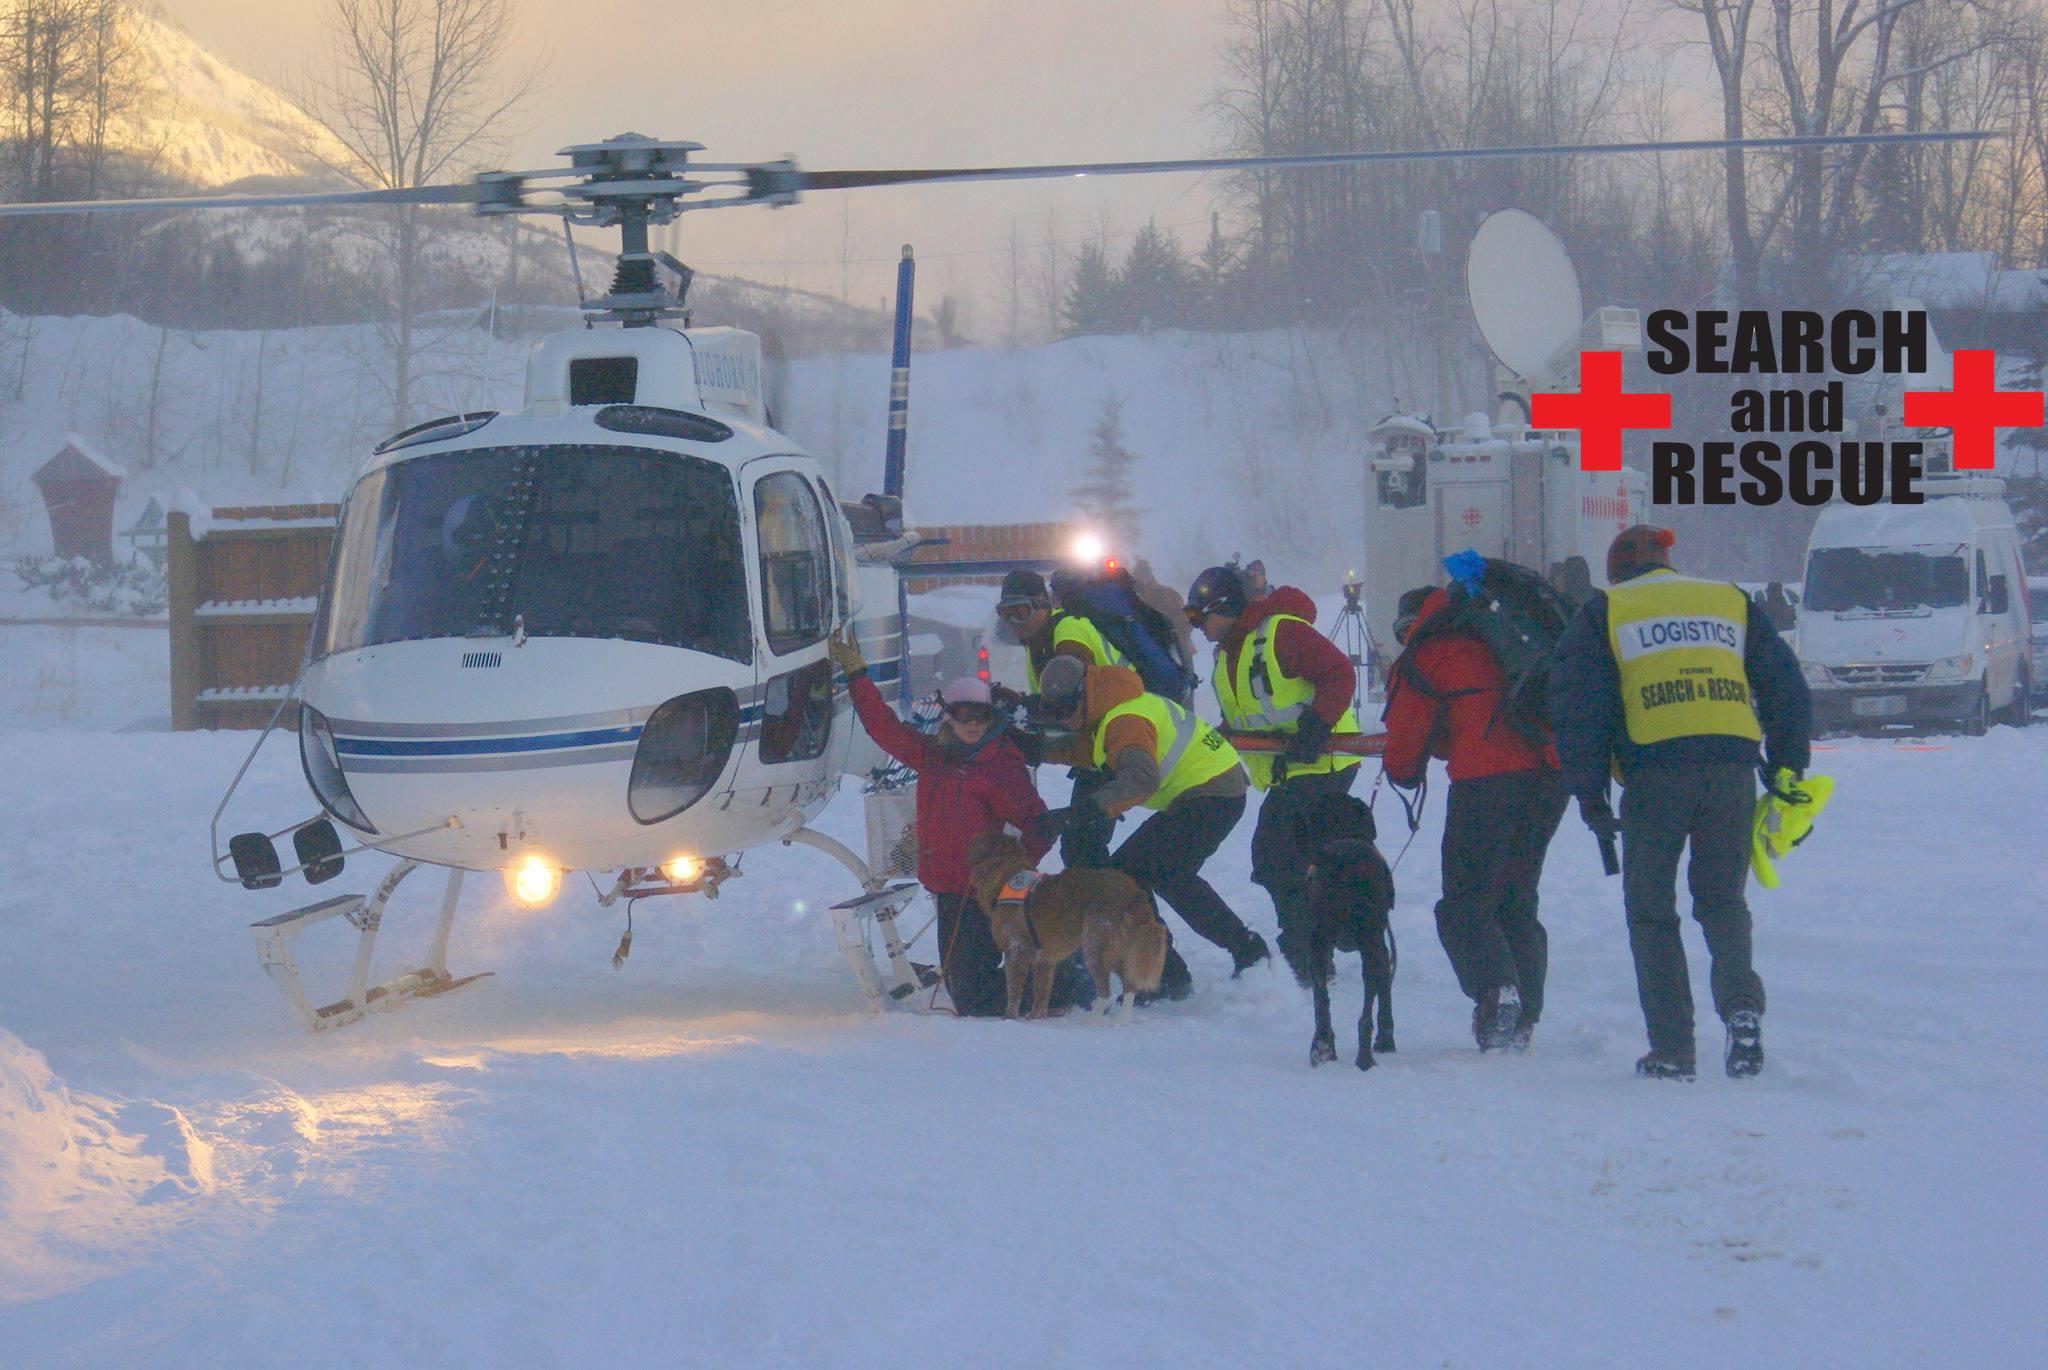 Local SAR pulls man from small avalanche near AB border